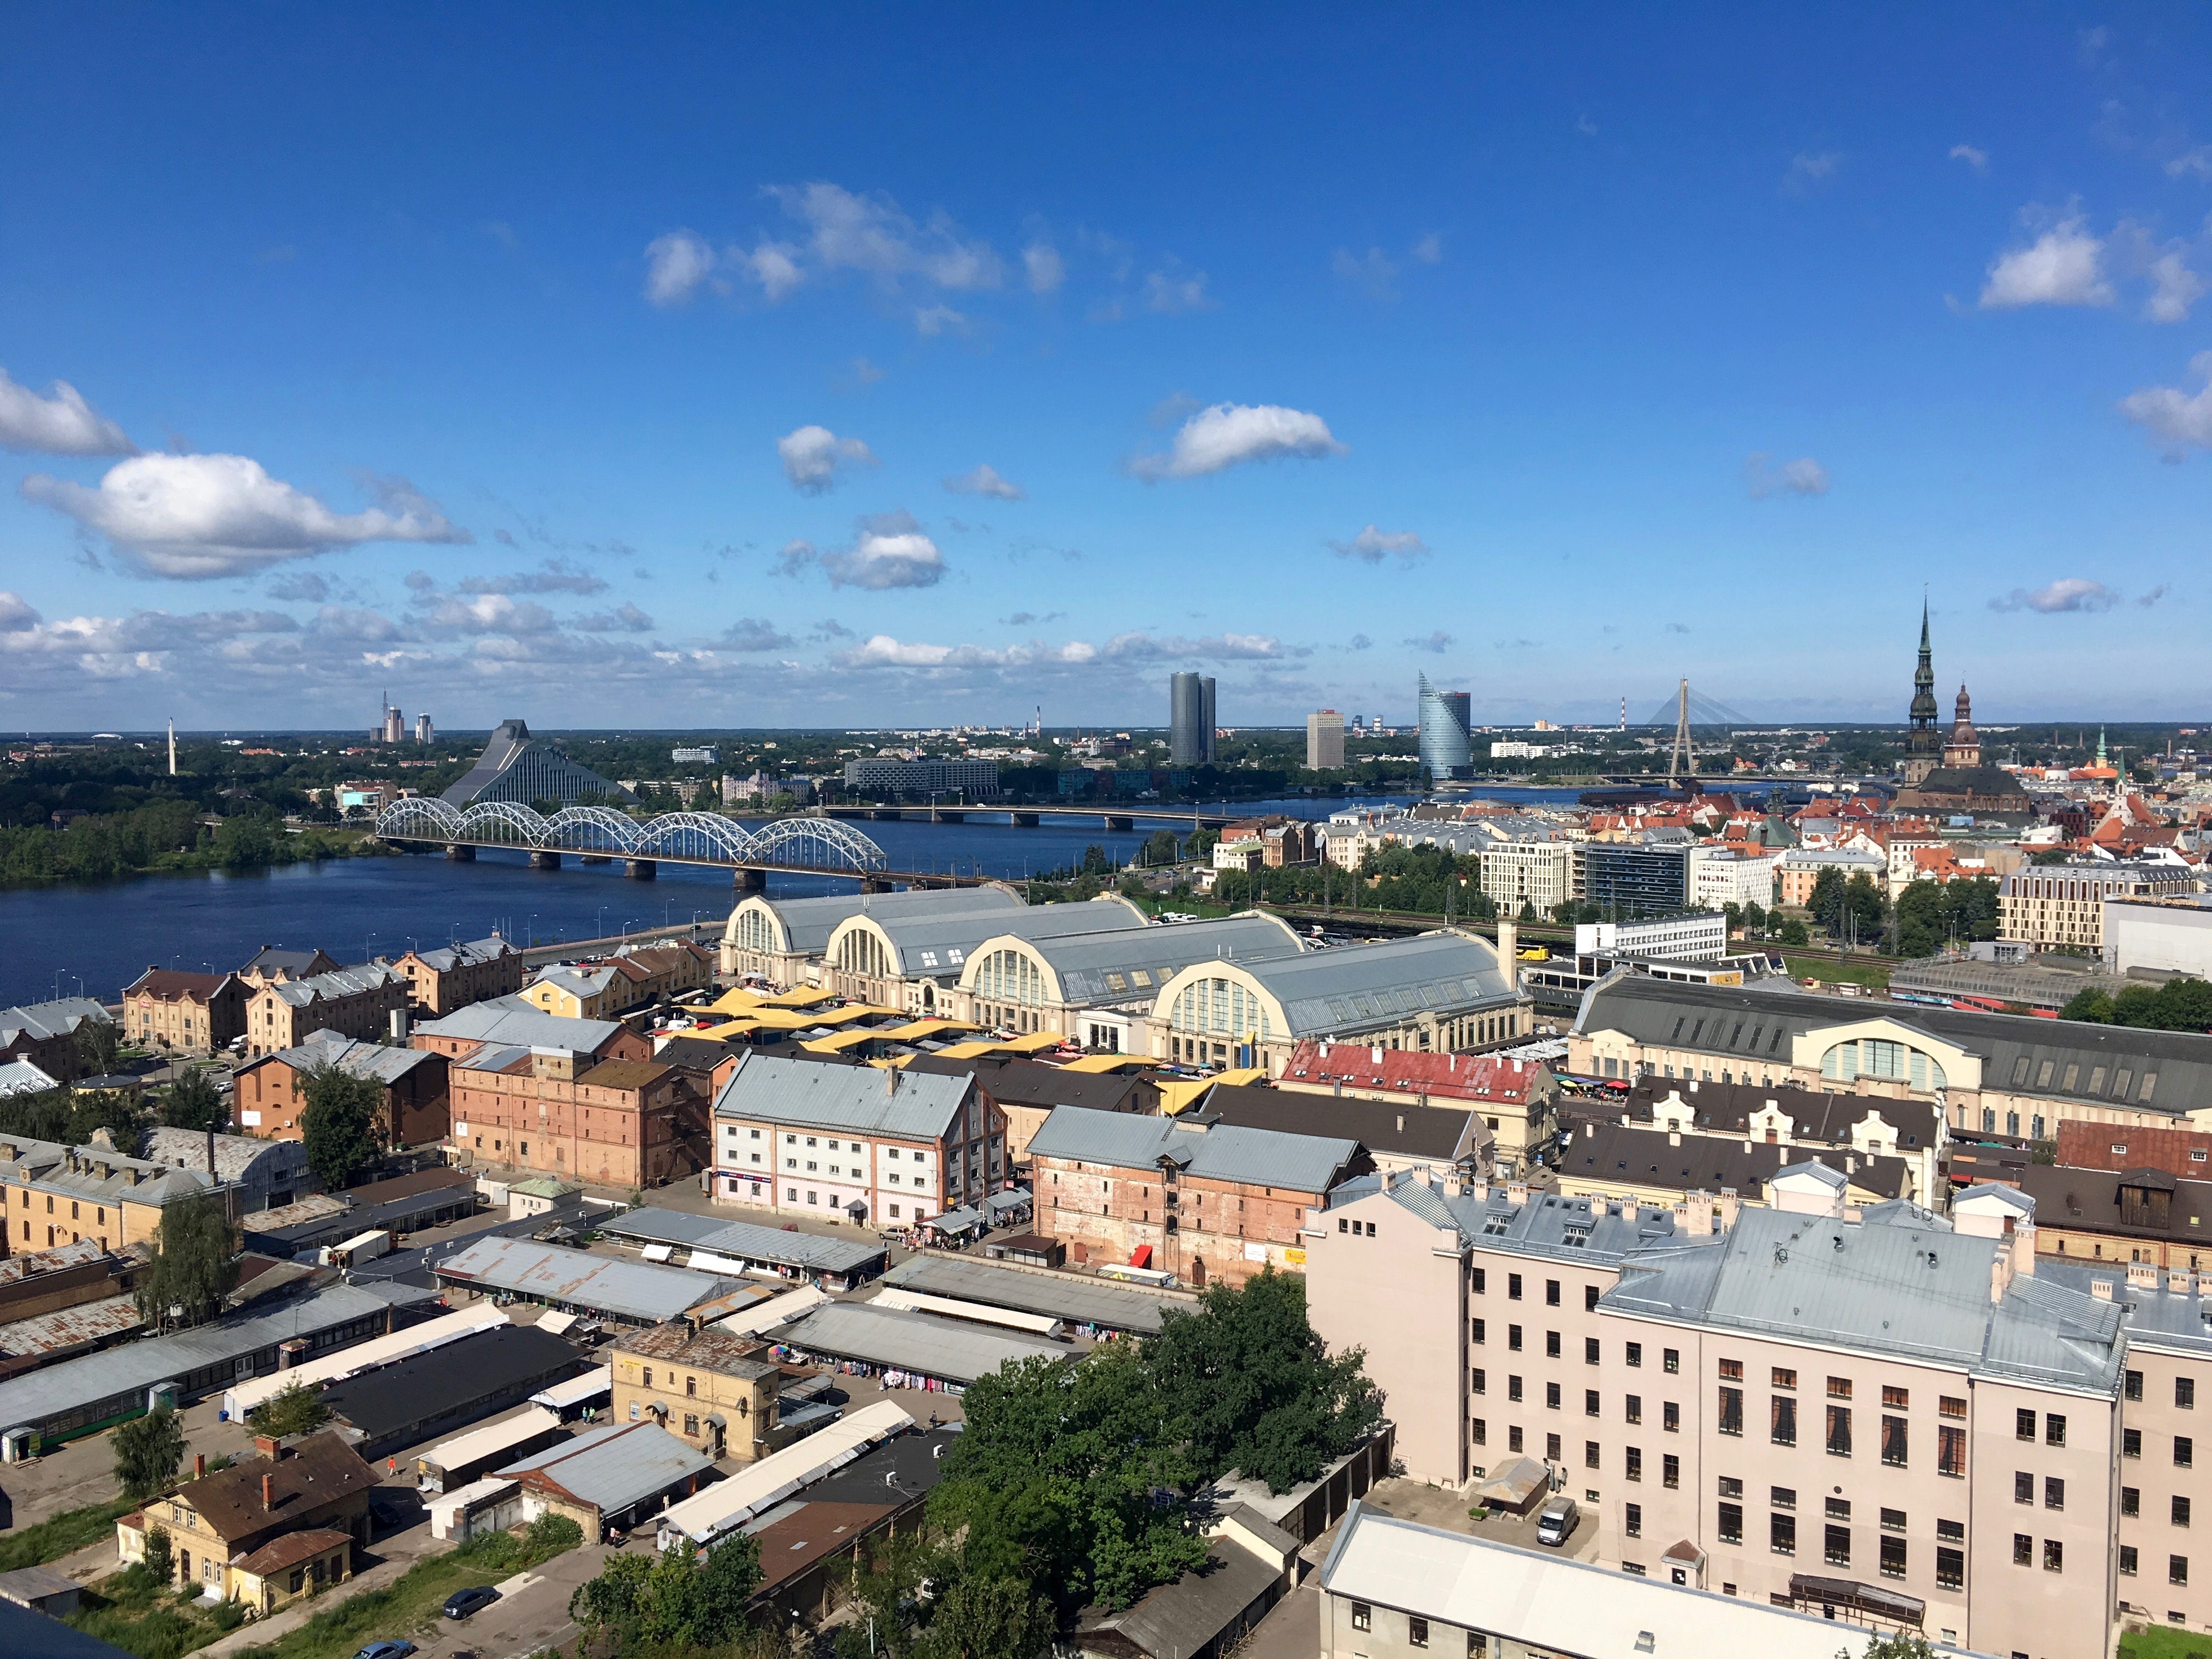 Reisetipp Riga: Blick auf den Zentralmarkt